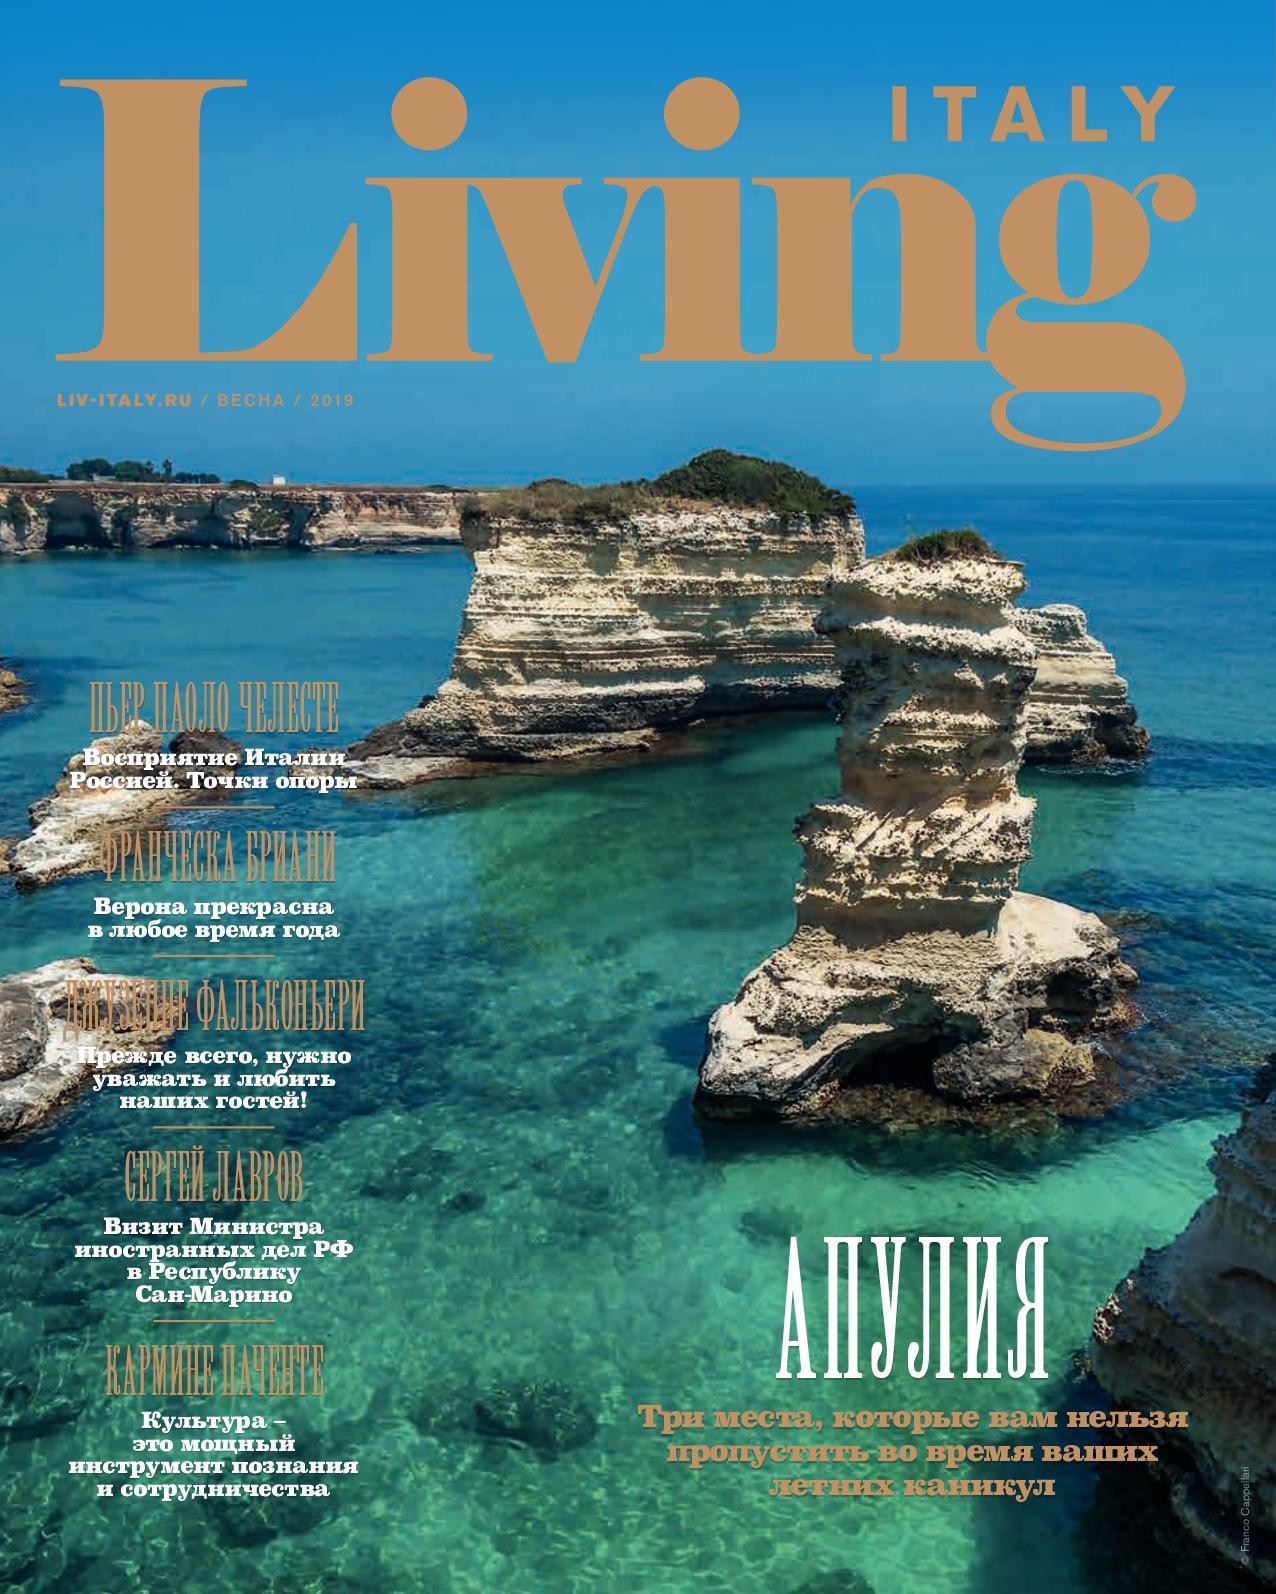 821f8aa6 Calaméo - Living Italy Spring 2019